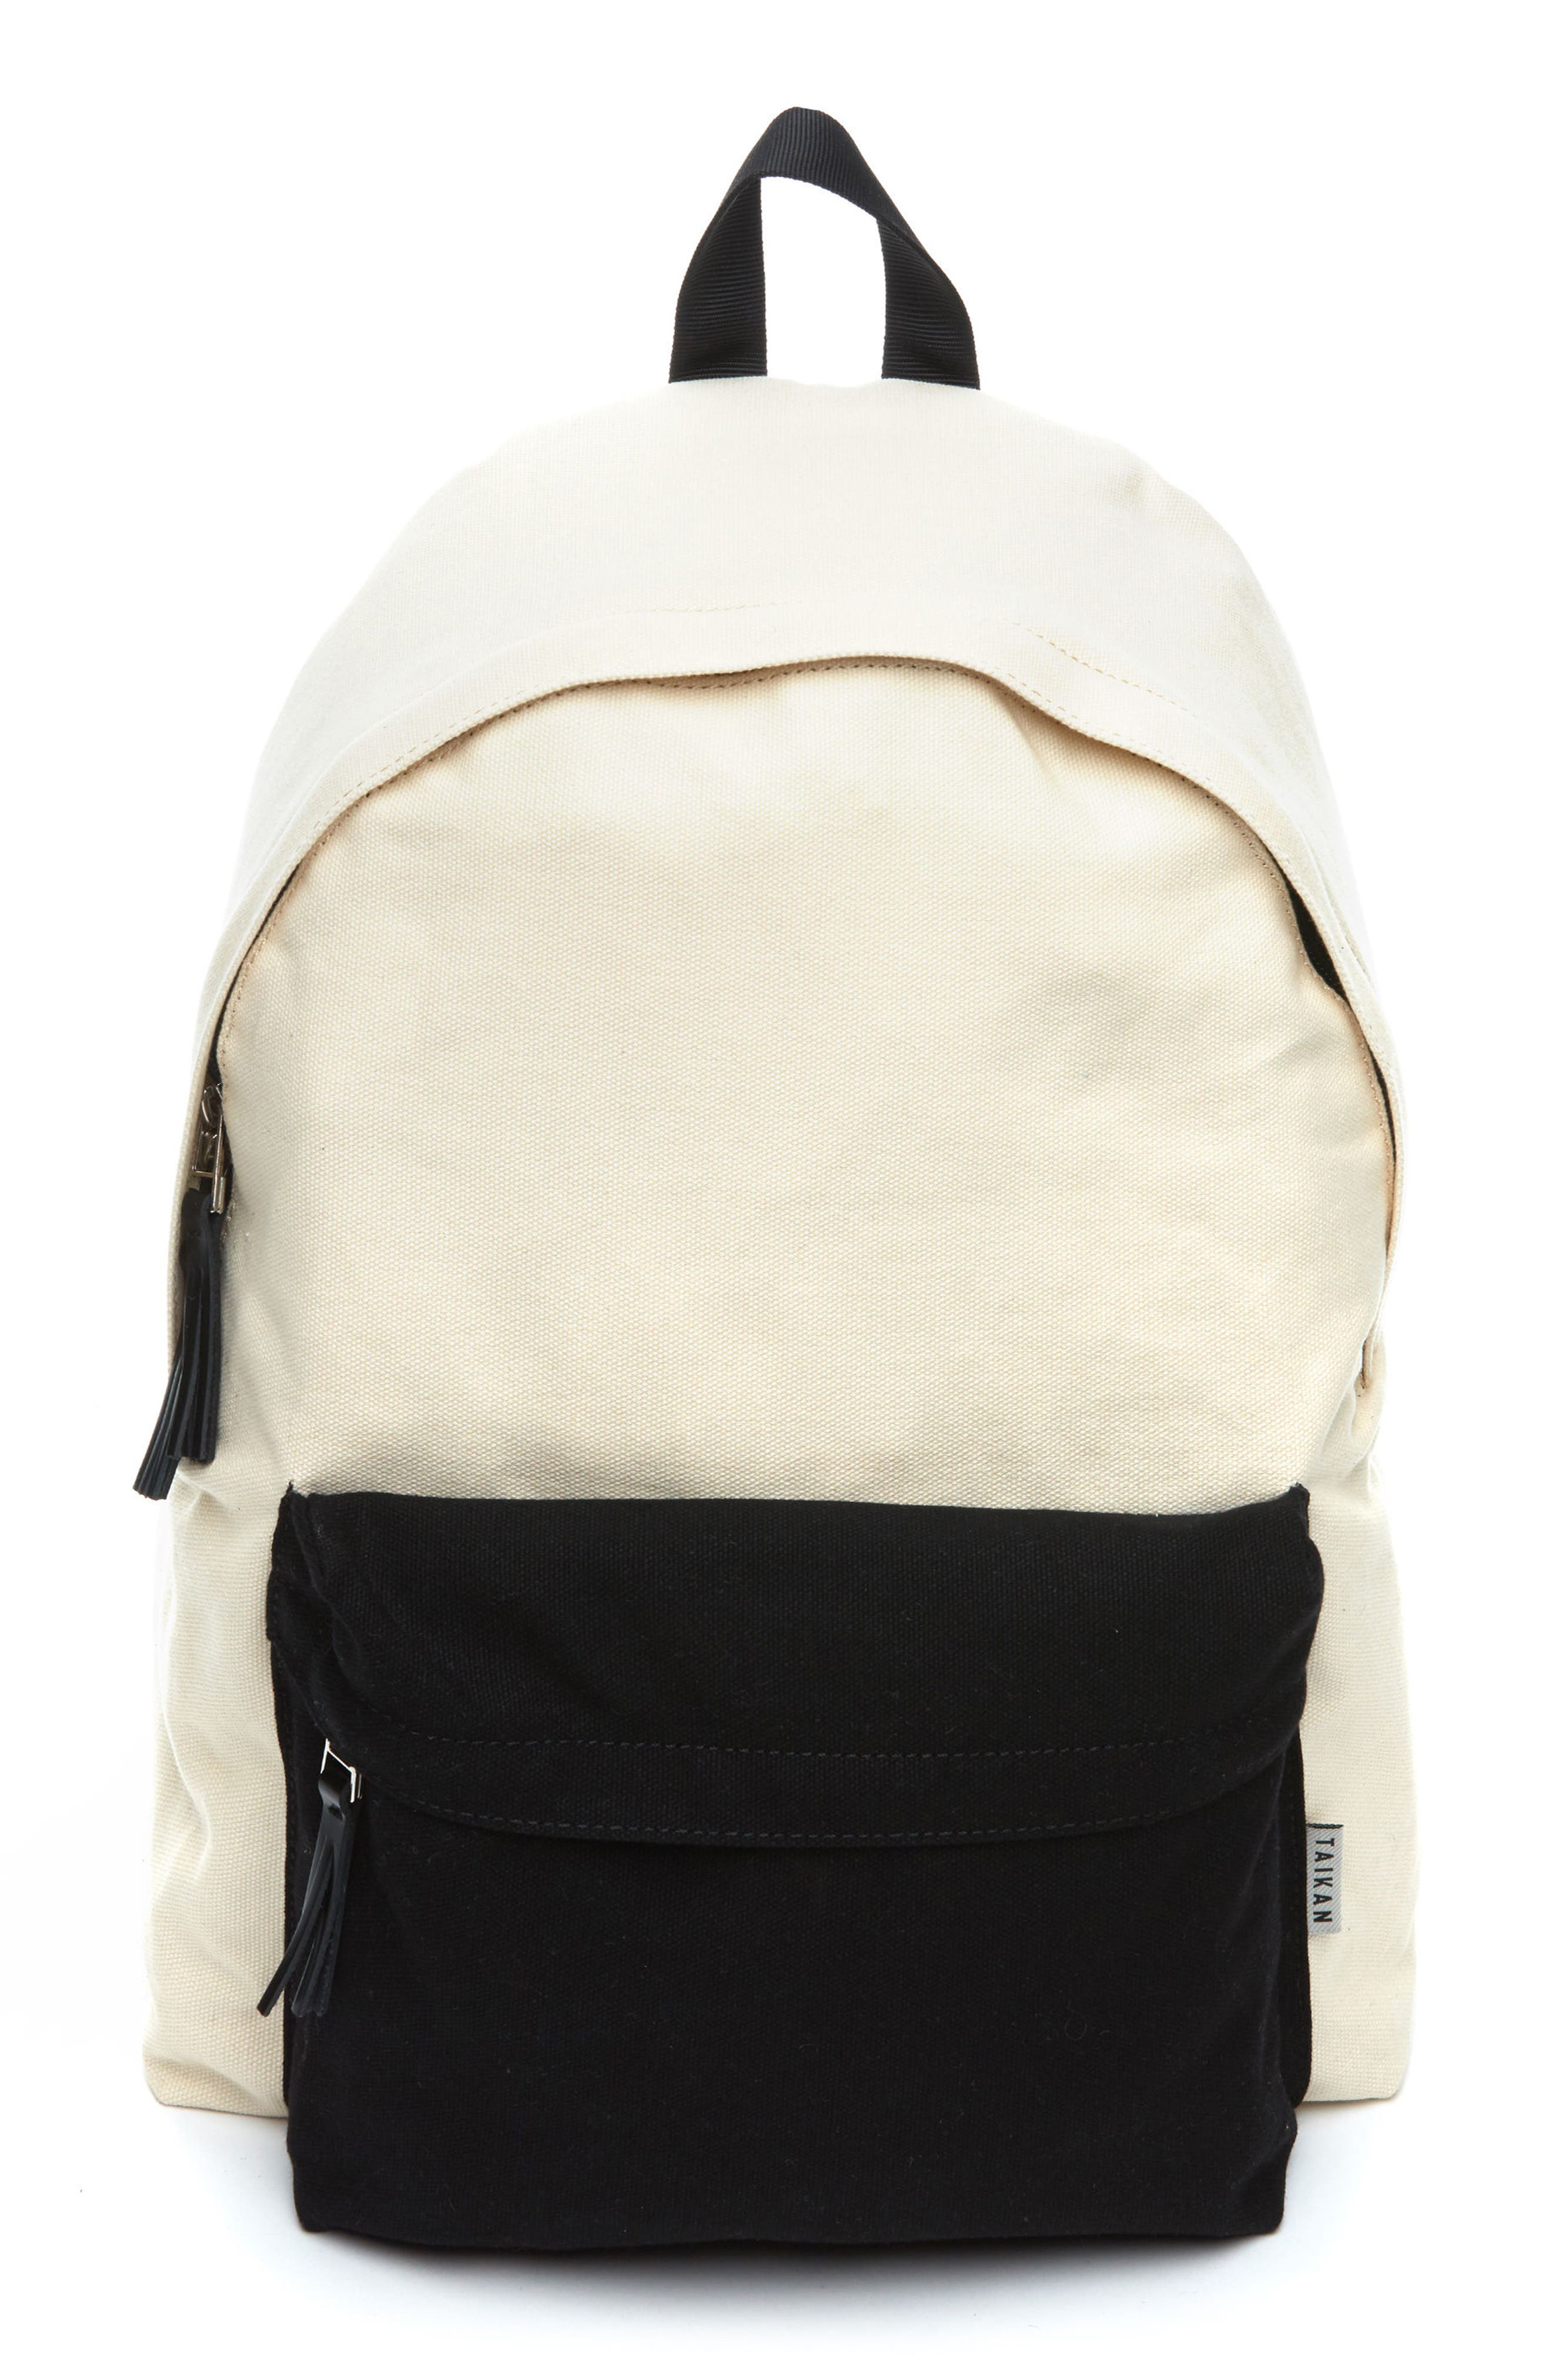 Hornet Backpack,                         Main,                         color, Natural Cotton